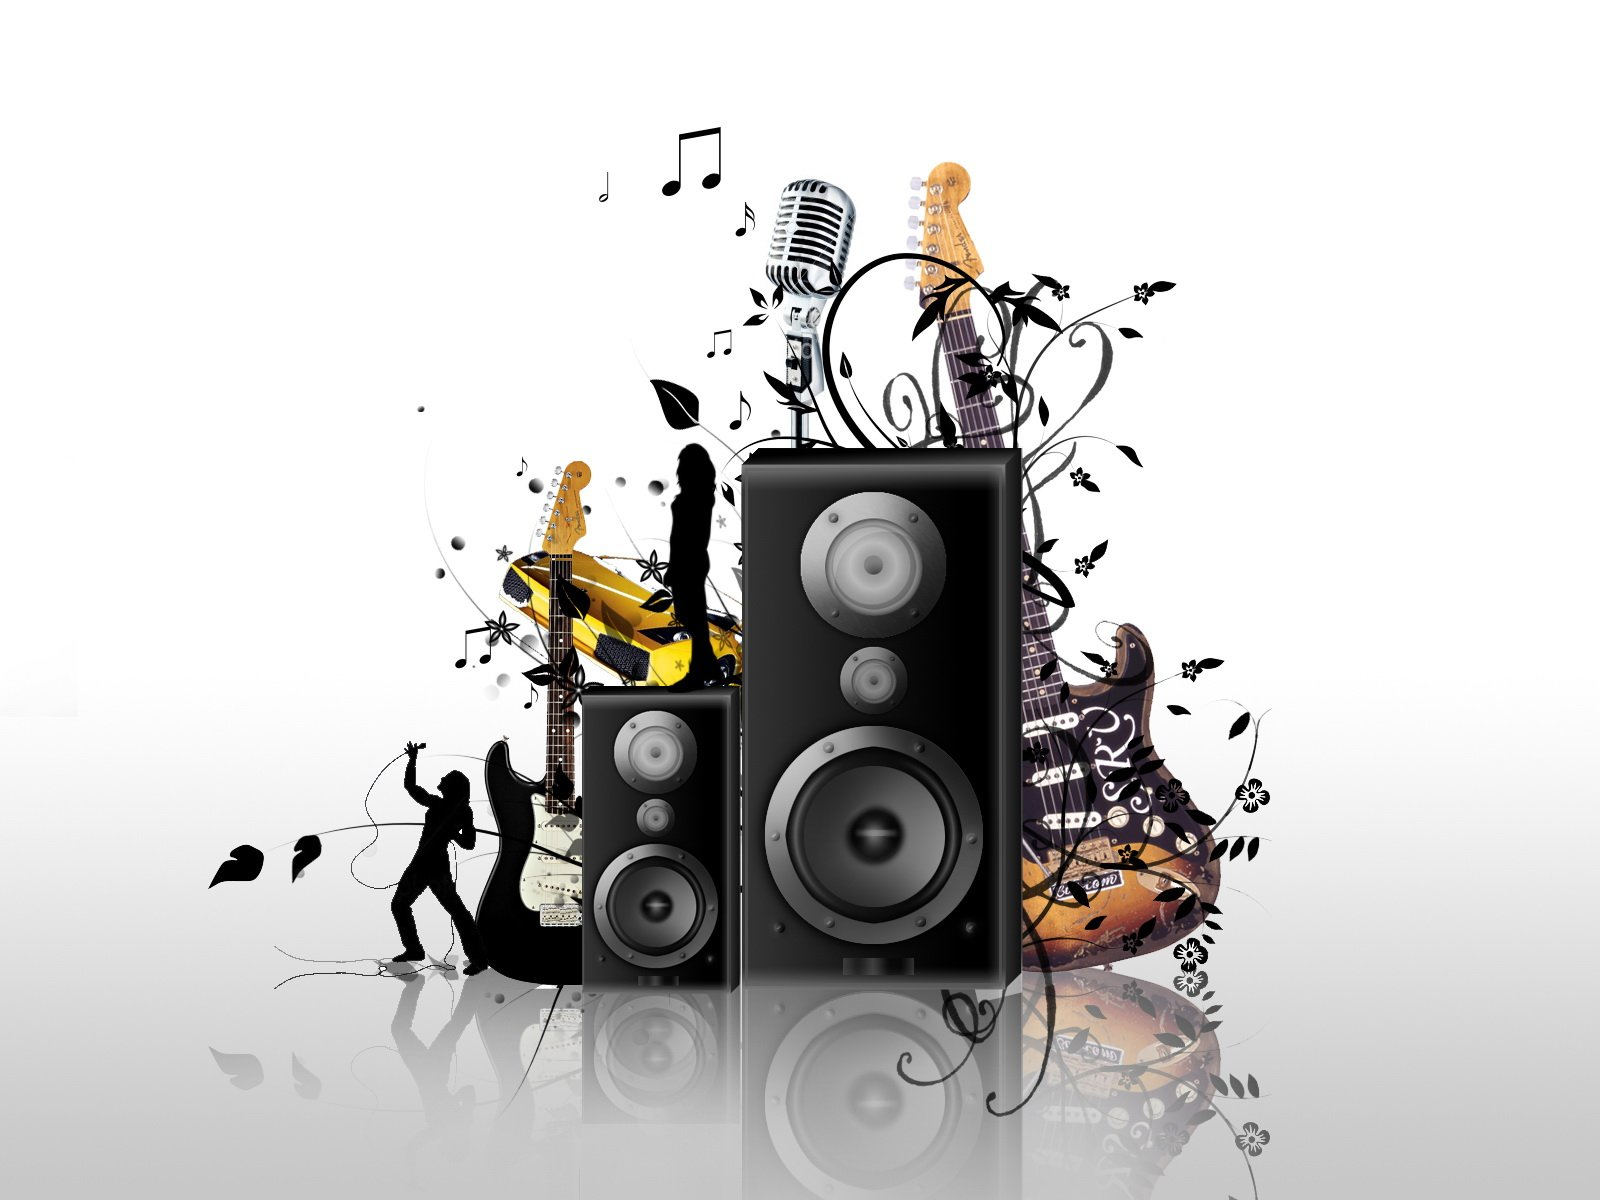 Music Wallpaper Cool Music Wallpapers 1600x1200